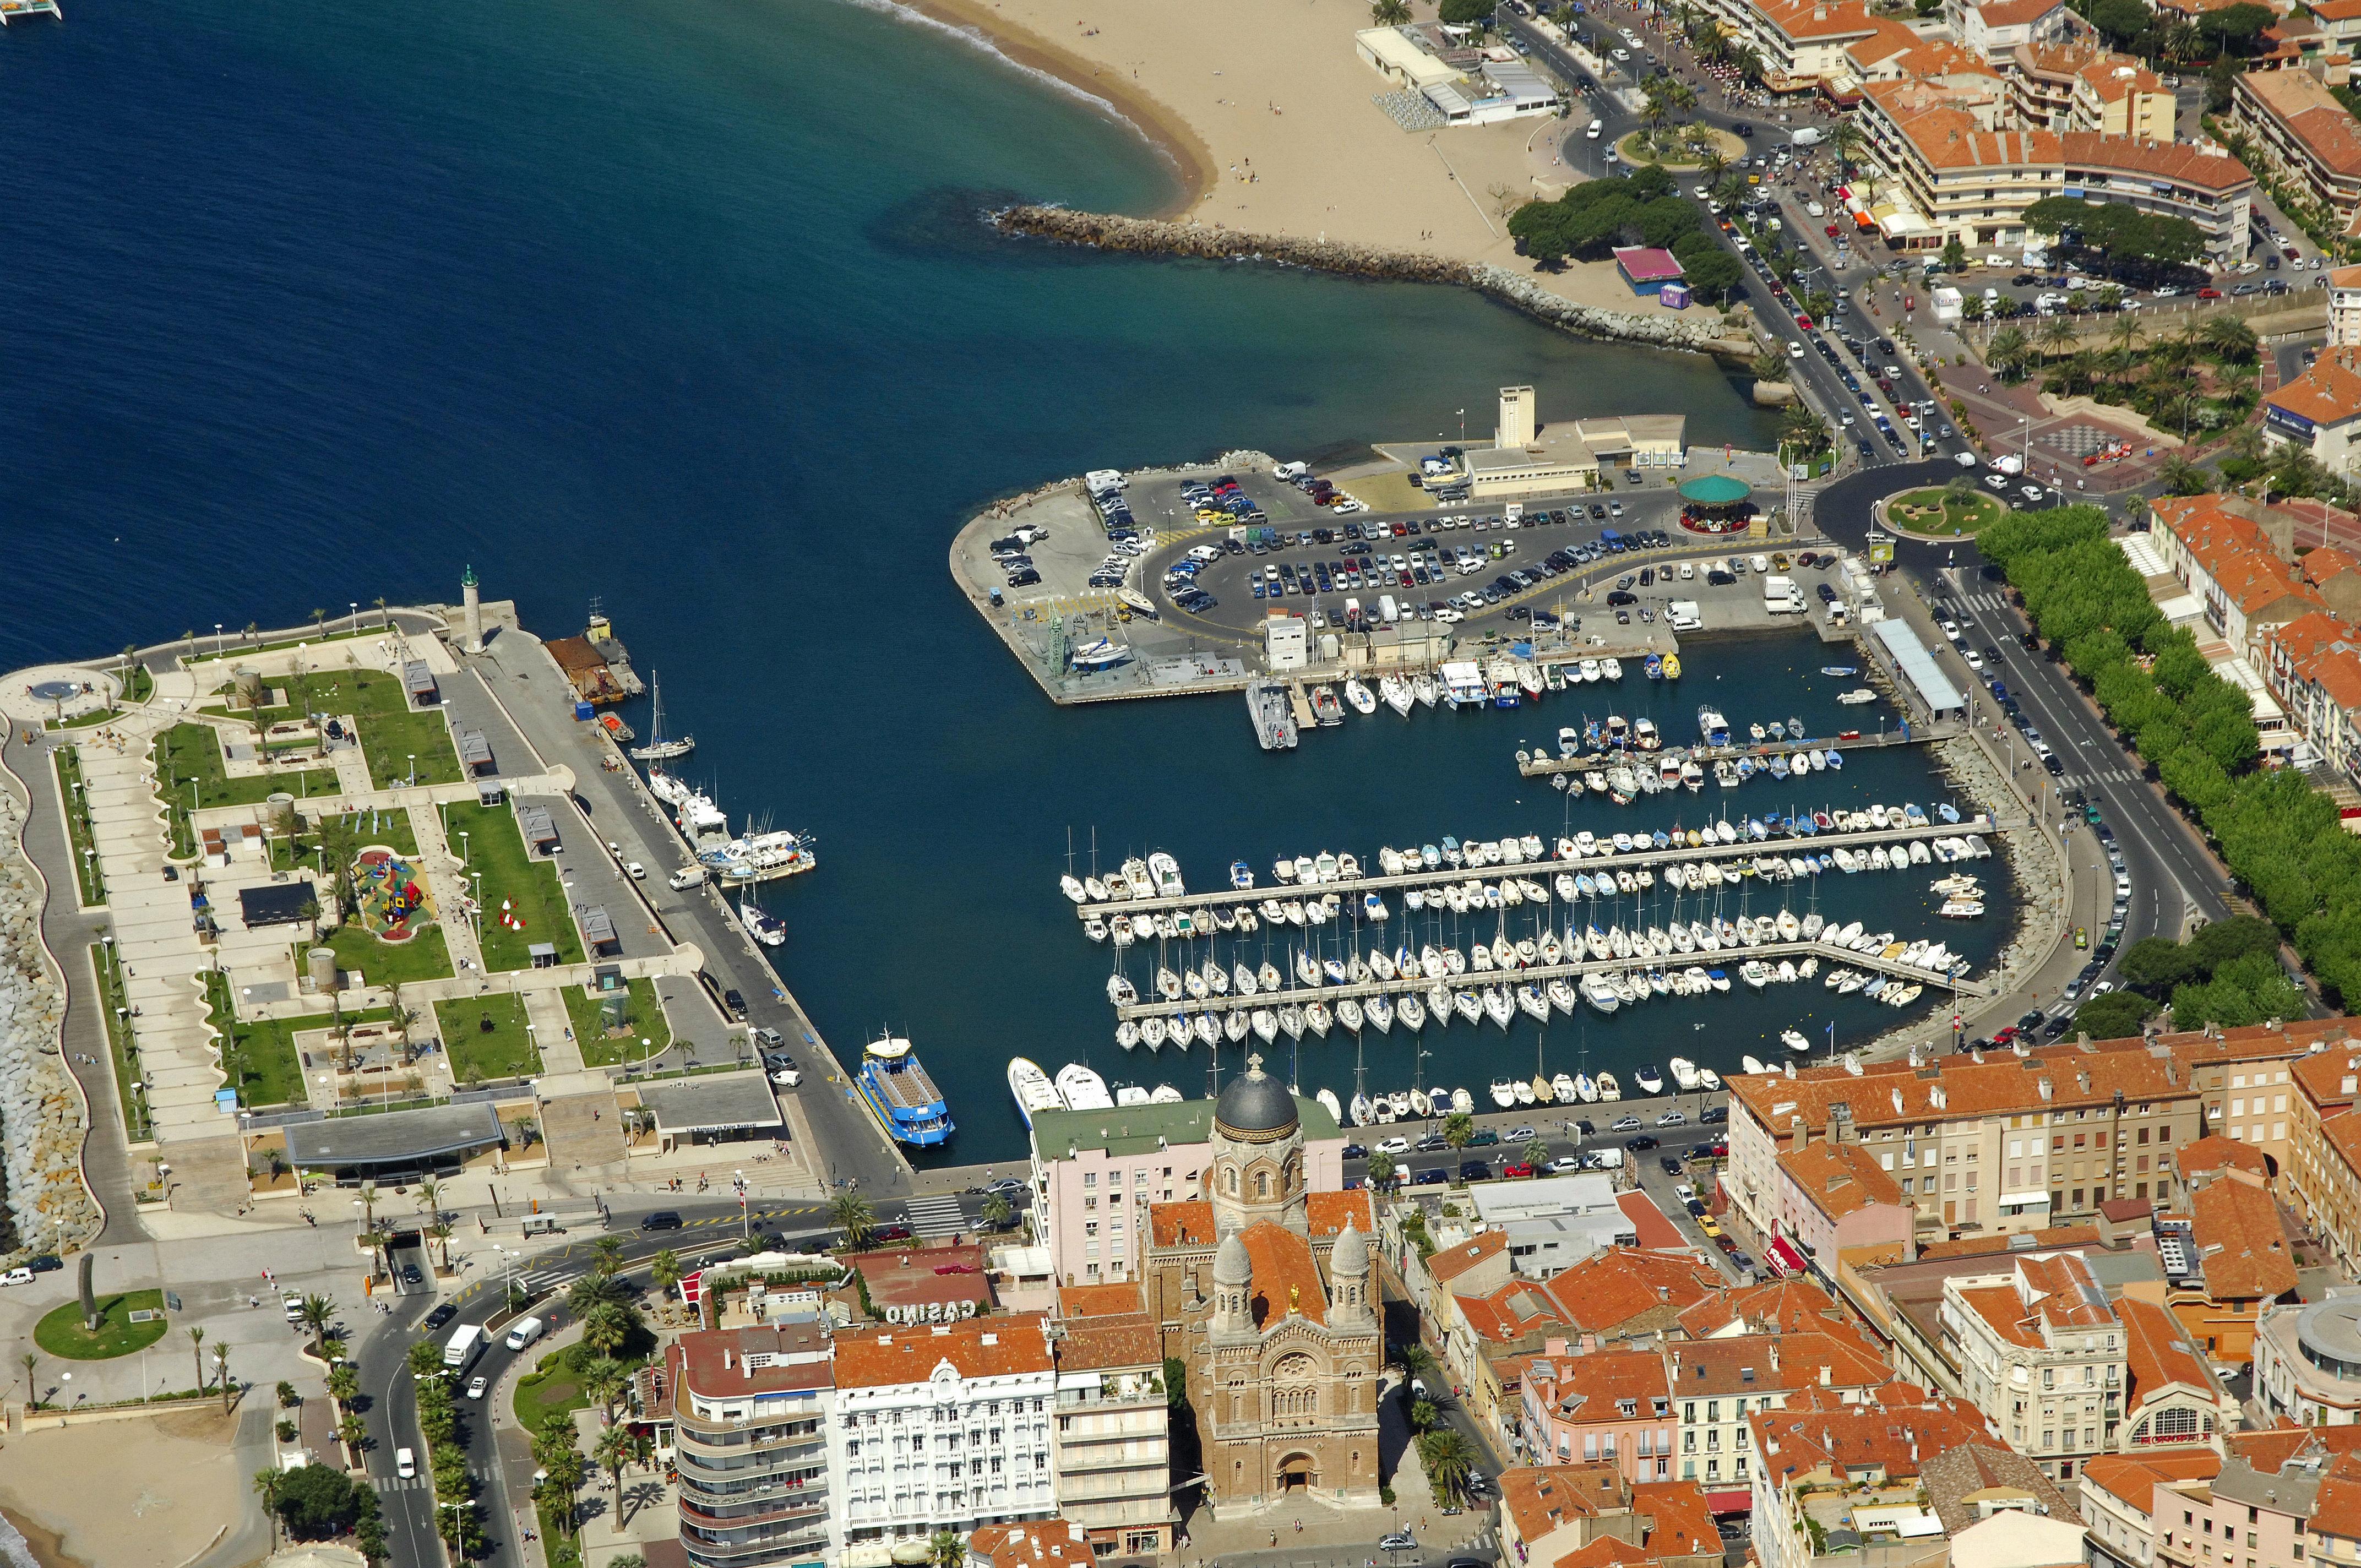 Vieux port st raphael in saint raphael france marina - Restaurant port santa lucia st raphael ...